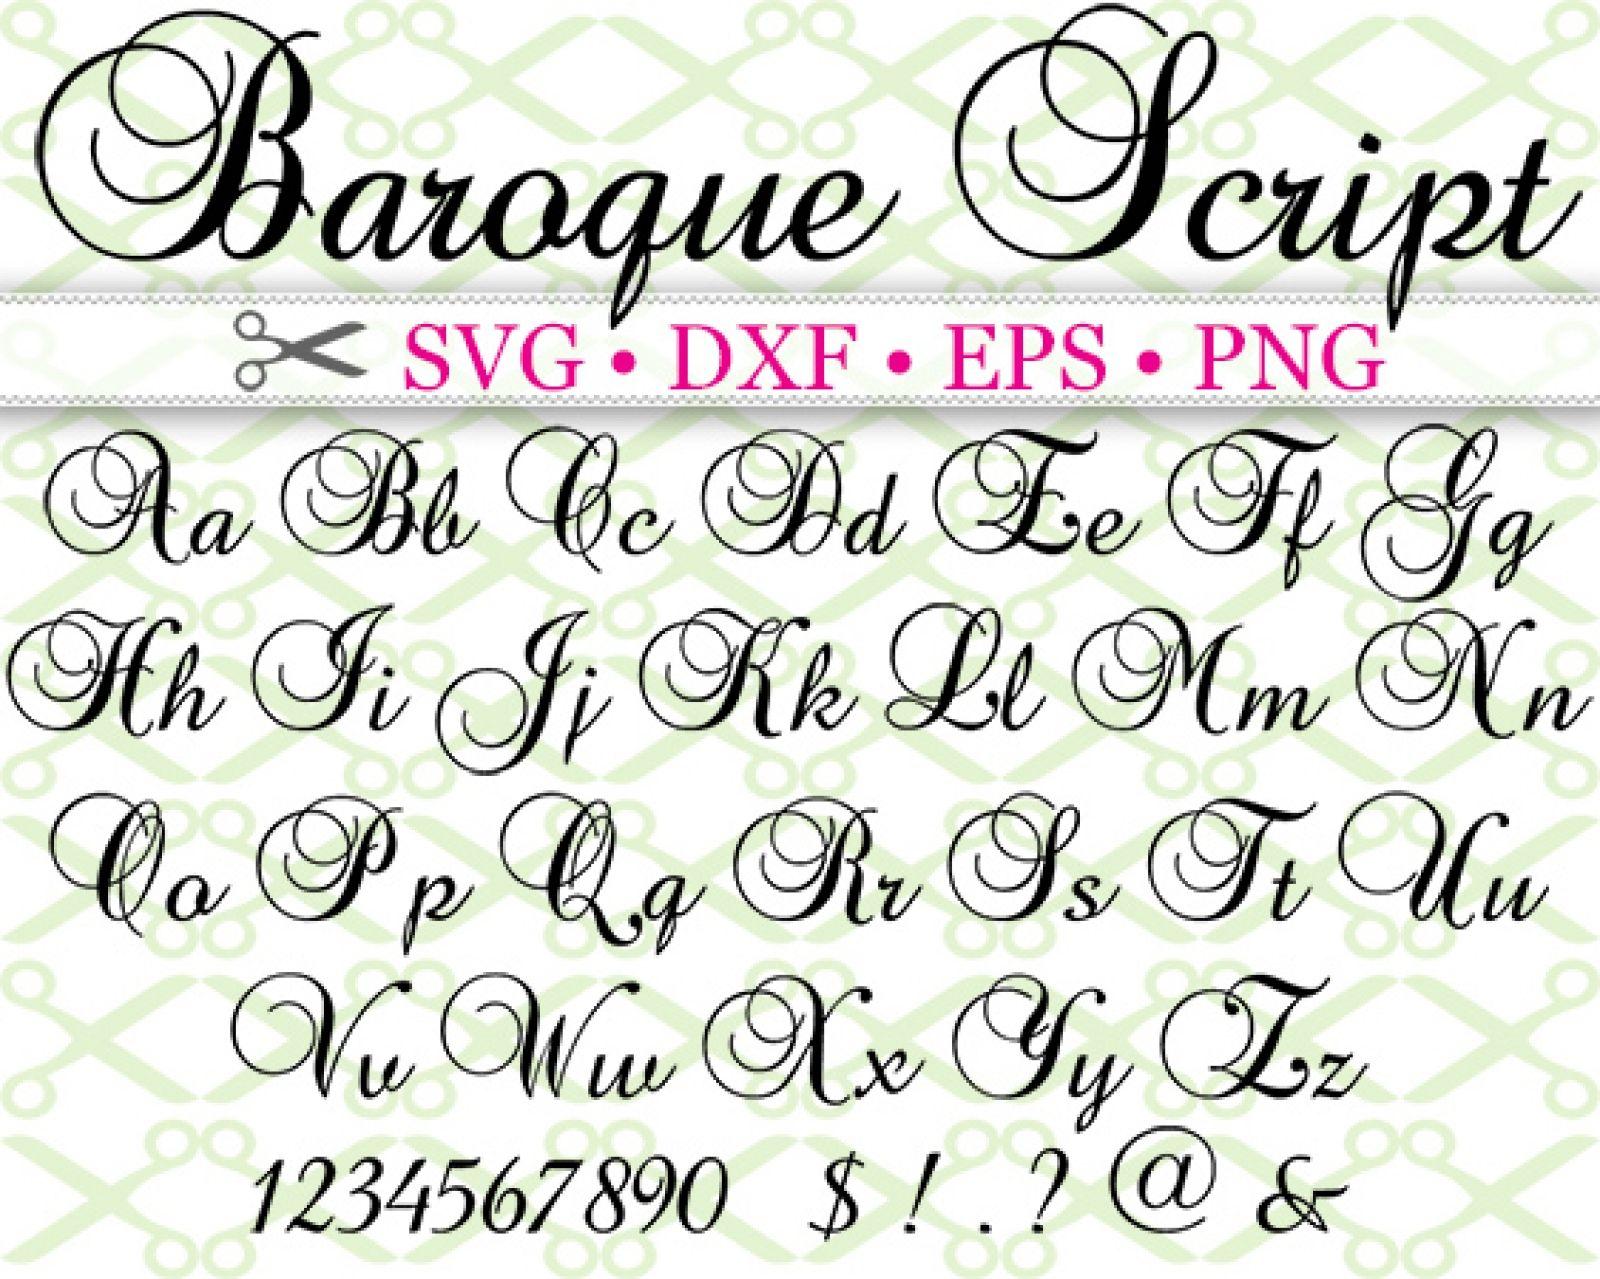 Baroque Script Svg Font With Images